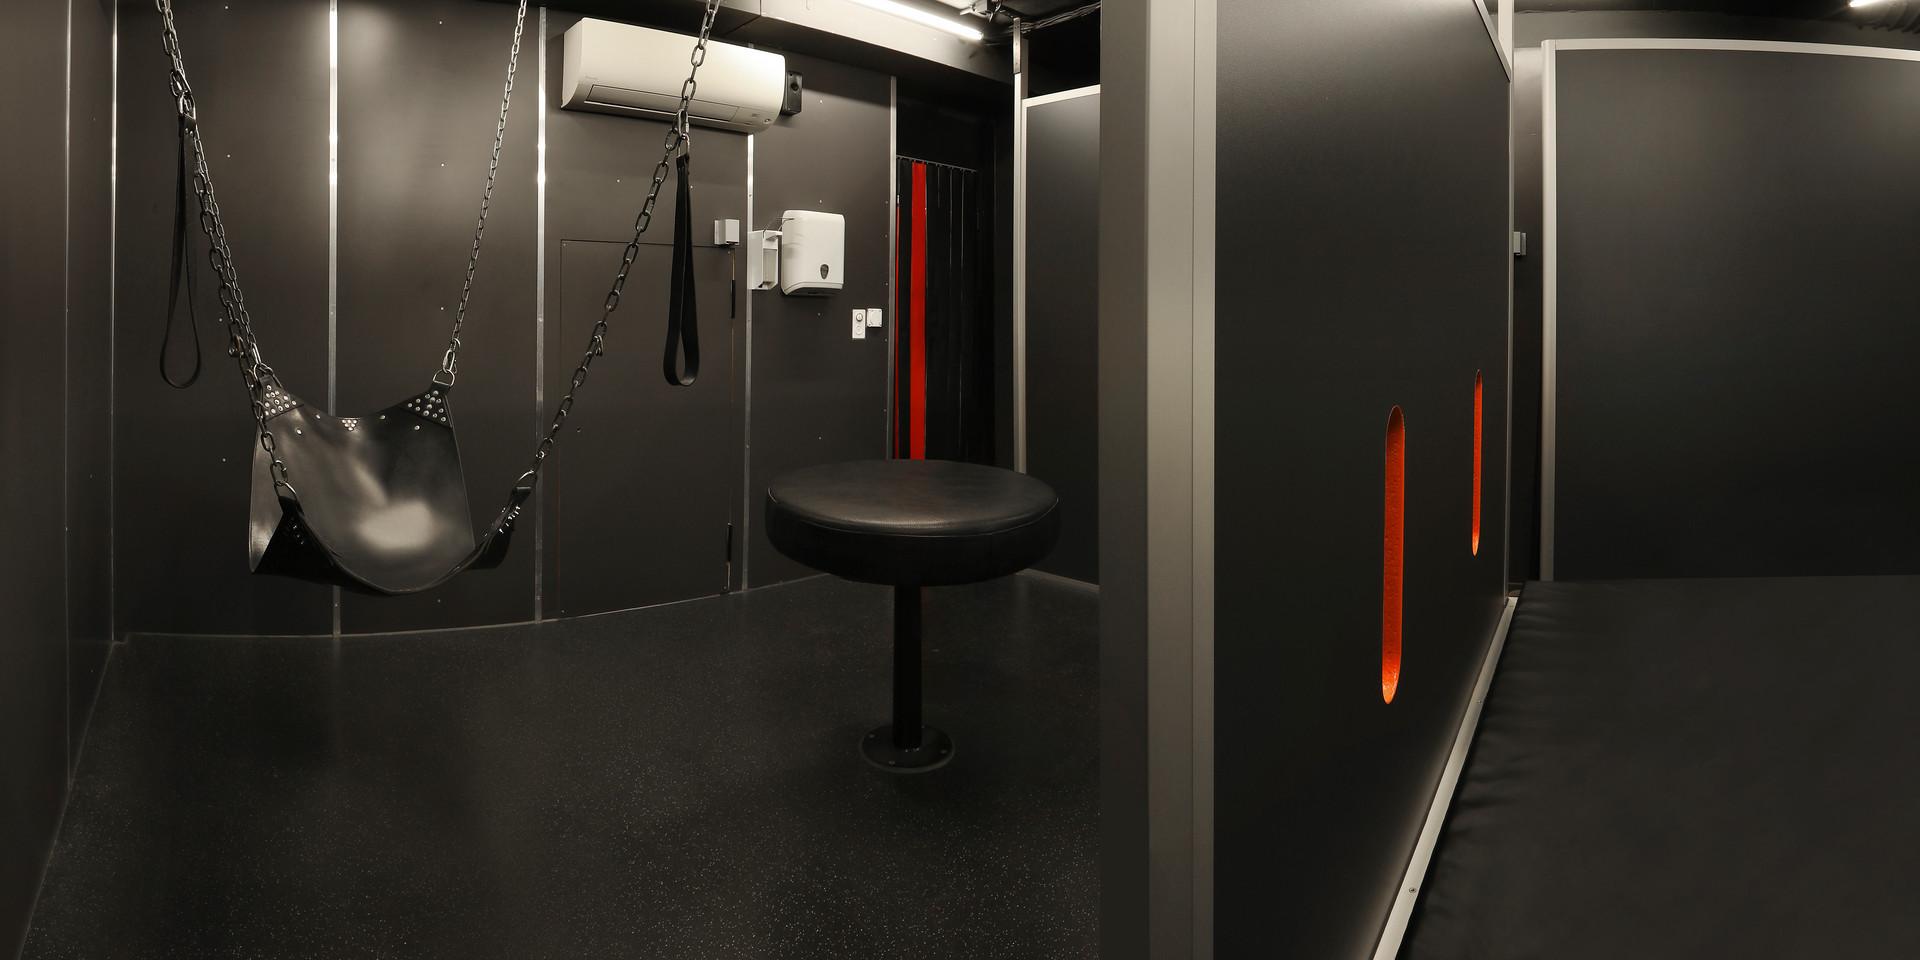 gay-sauna-renos-relax-club-playroom